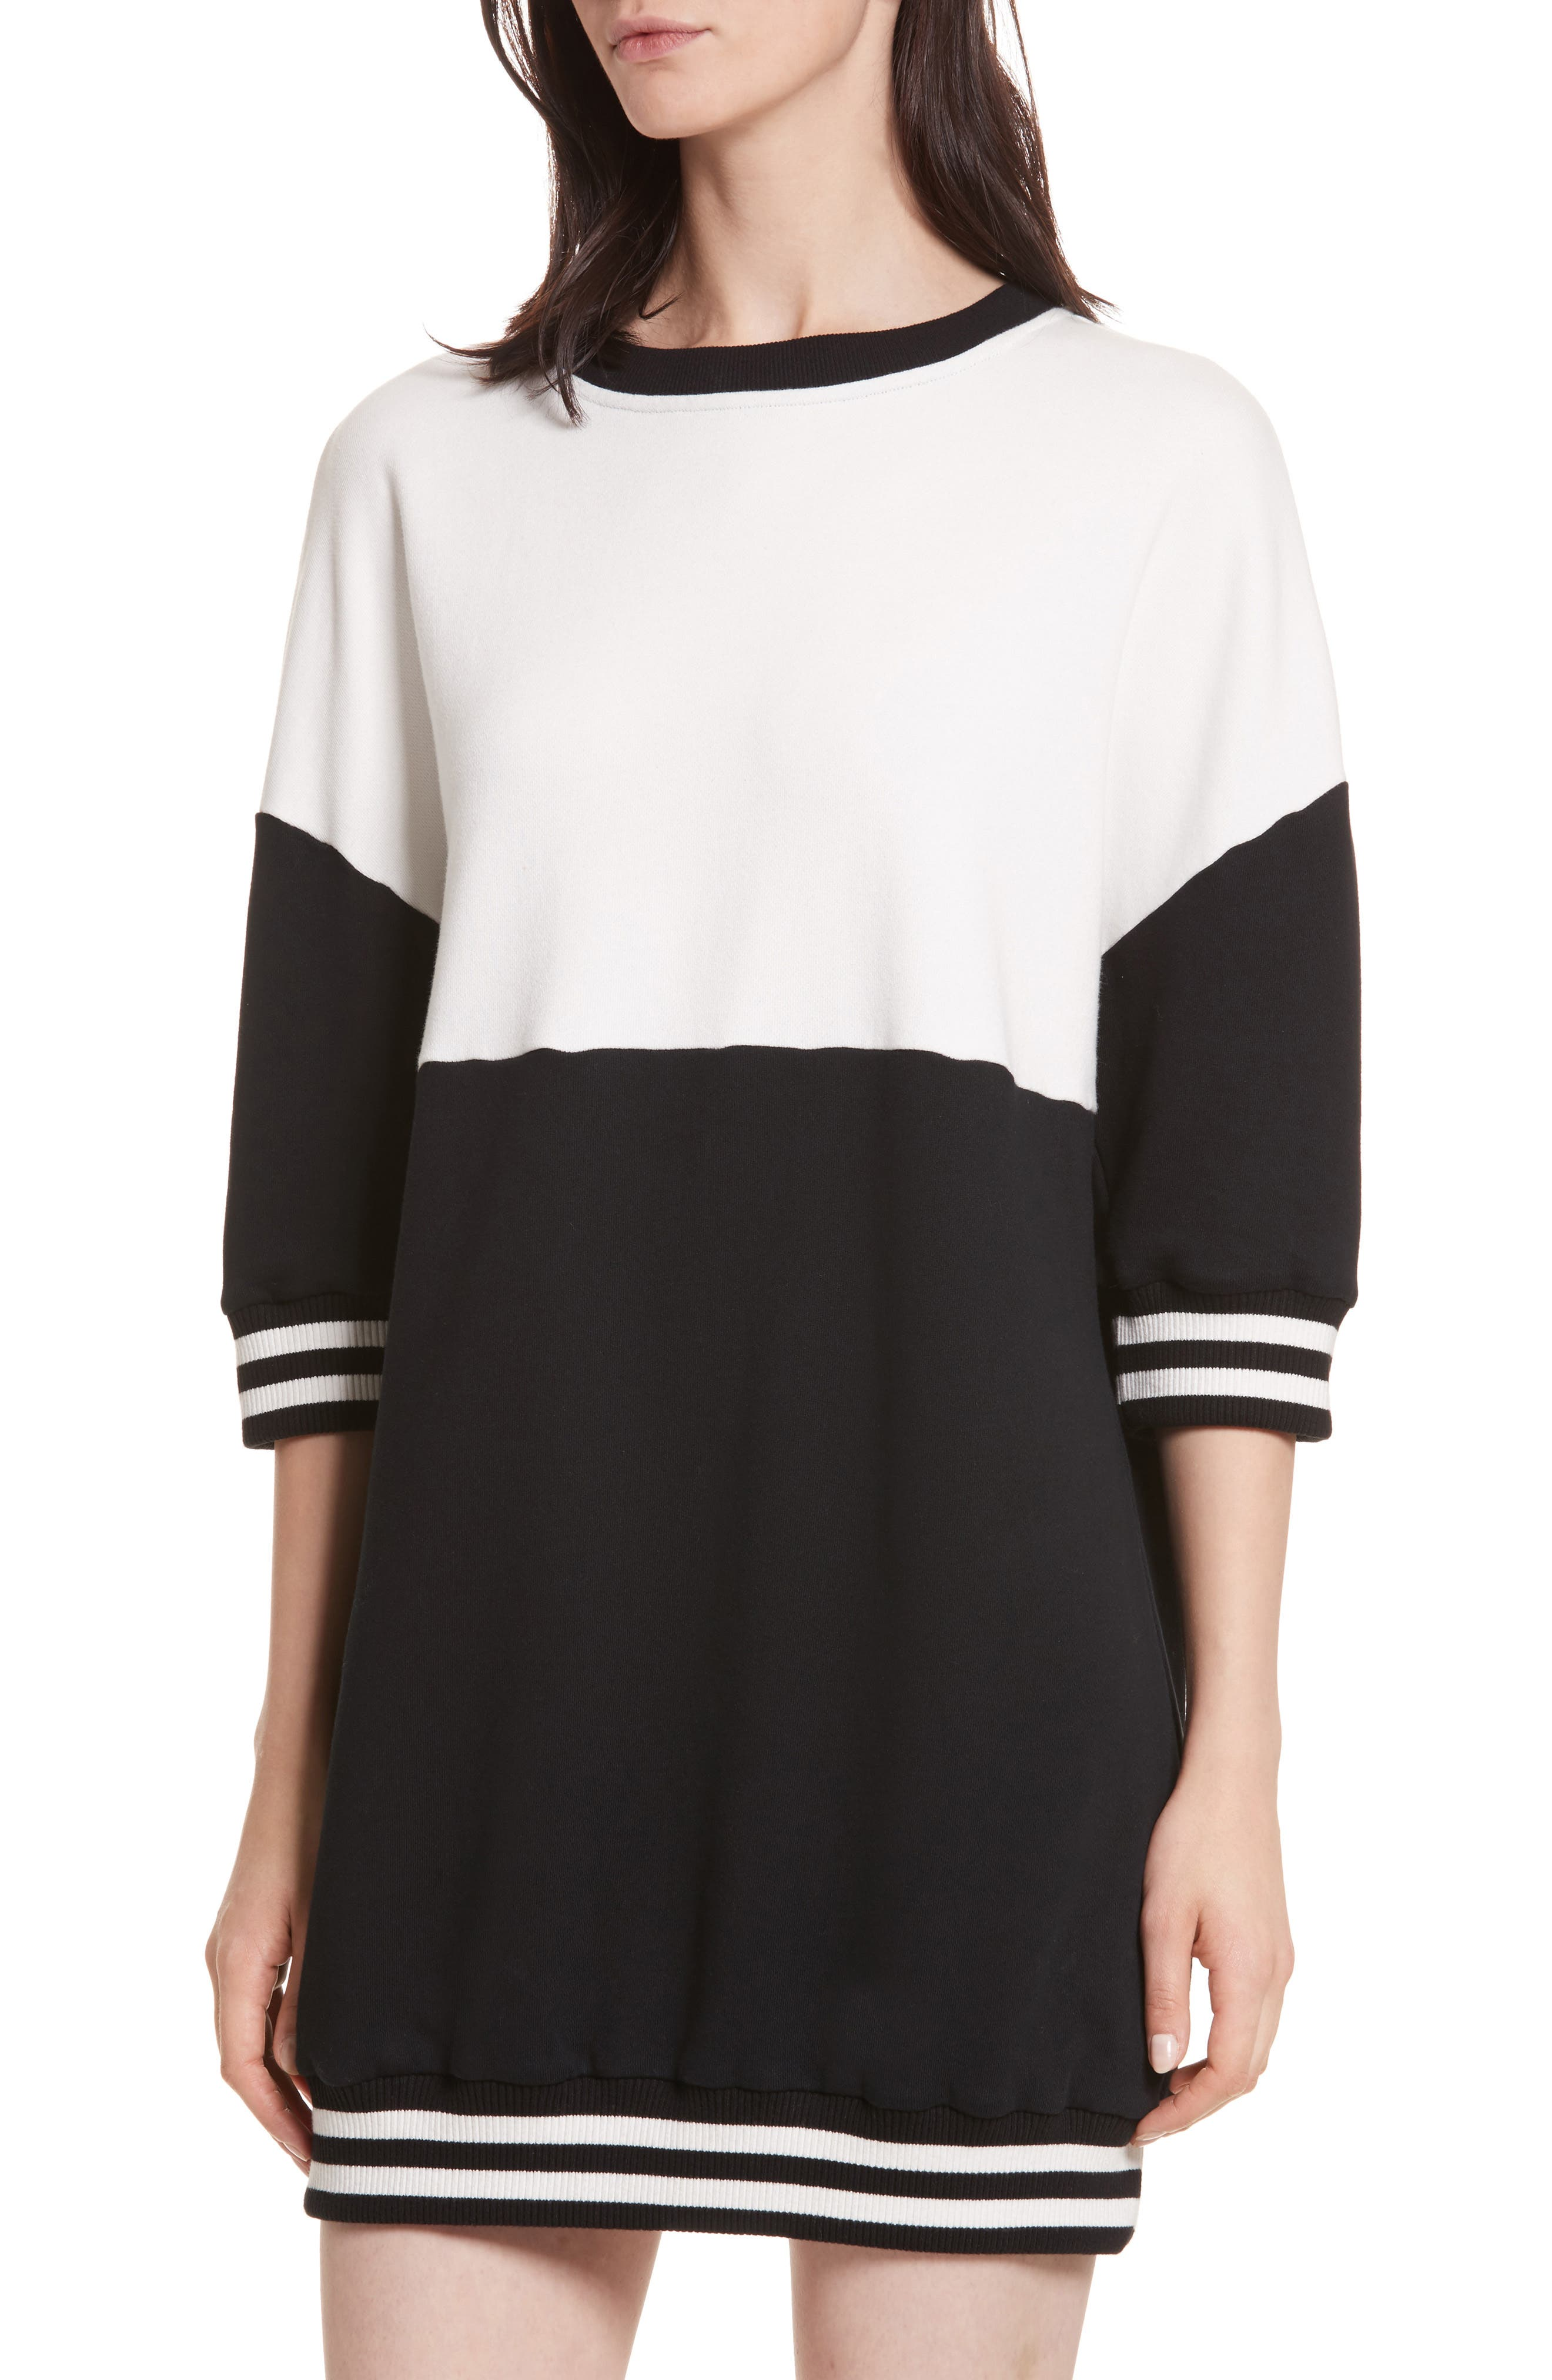 Gussie Colorblock Sweatshirt Dress,                             Alternate thumbnail 4, color,                             Black/ Off White